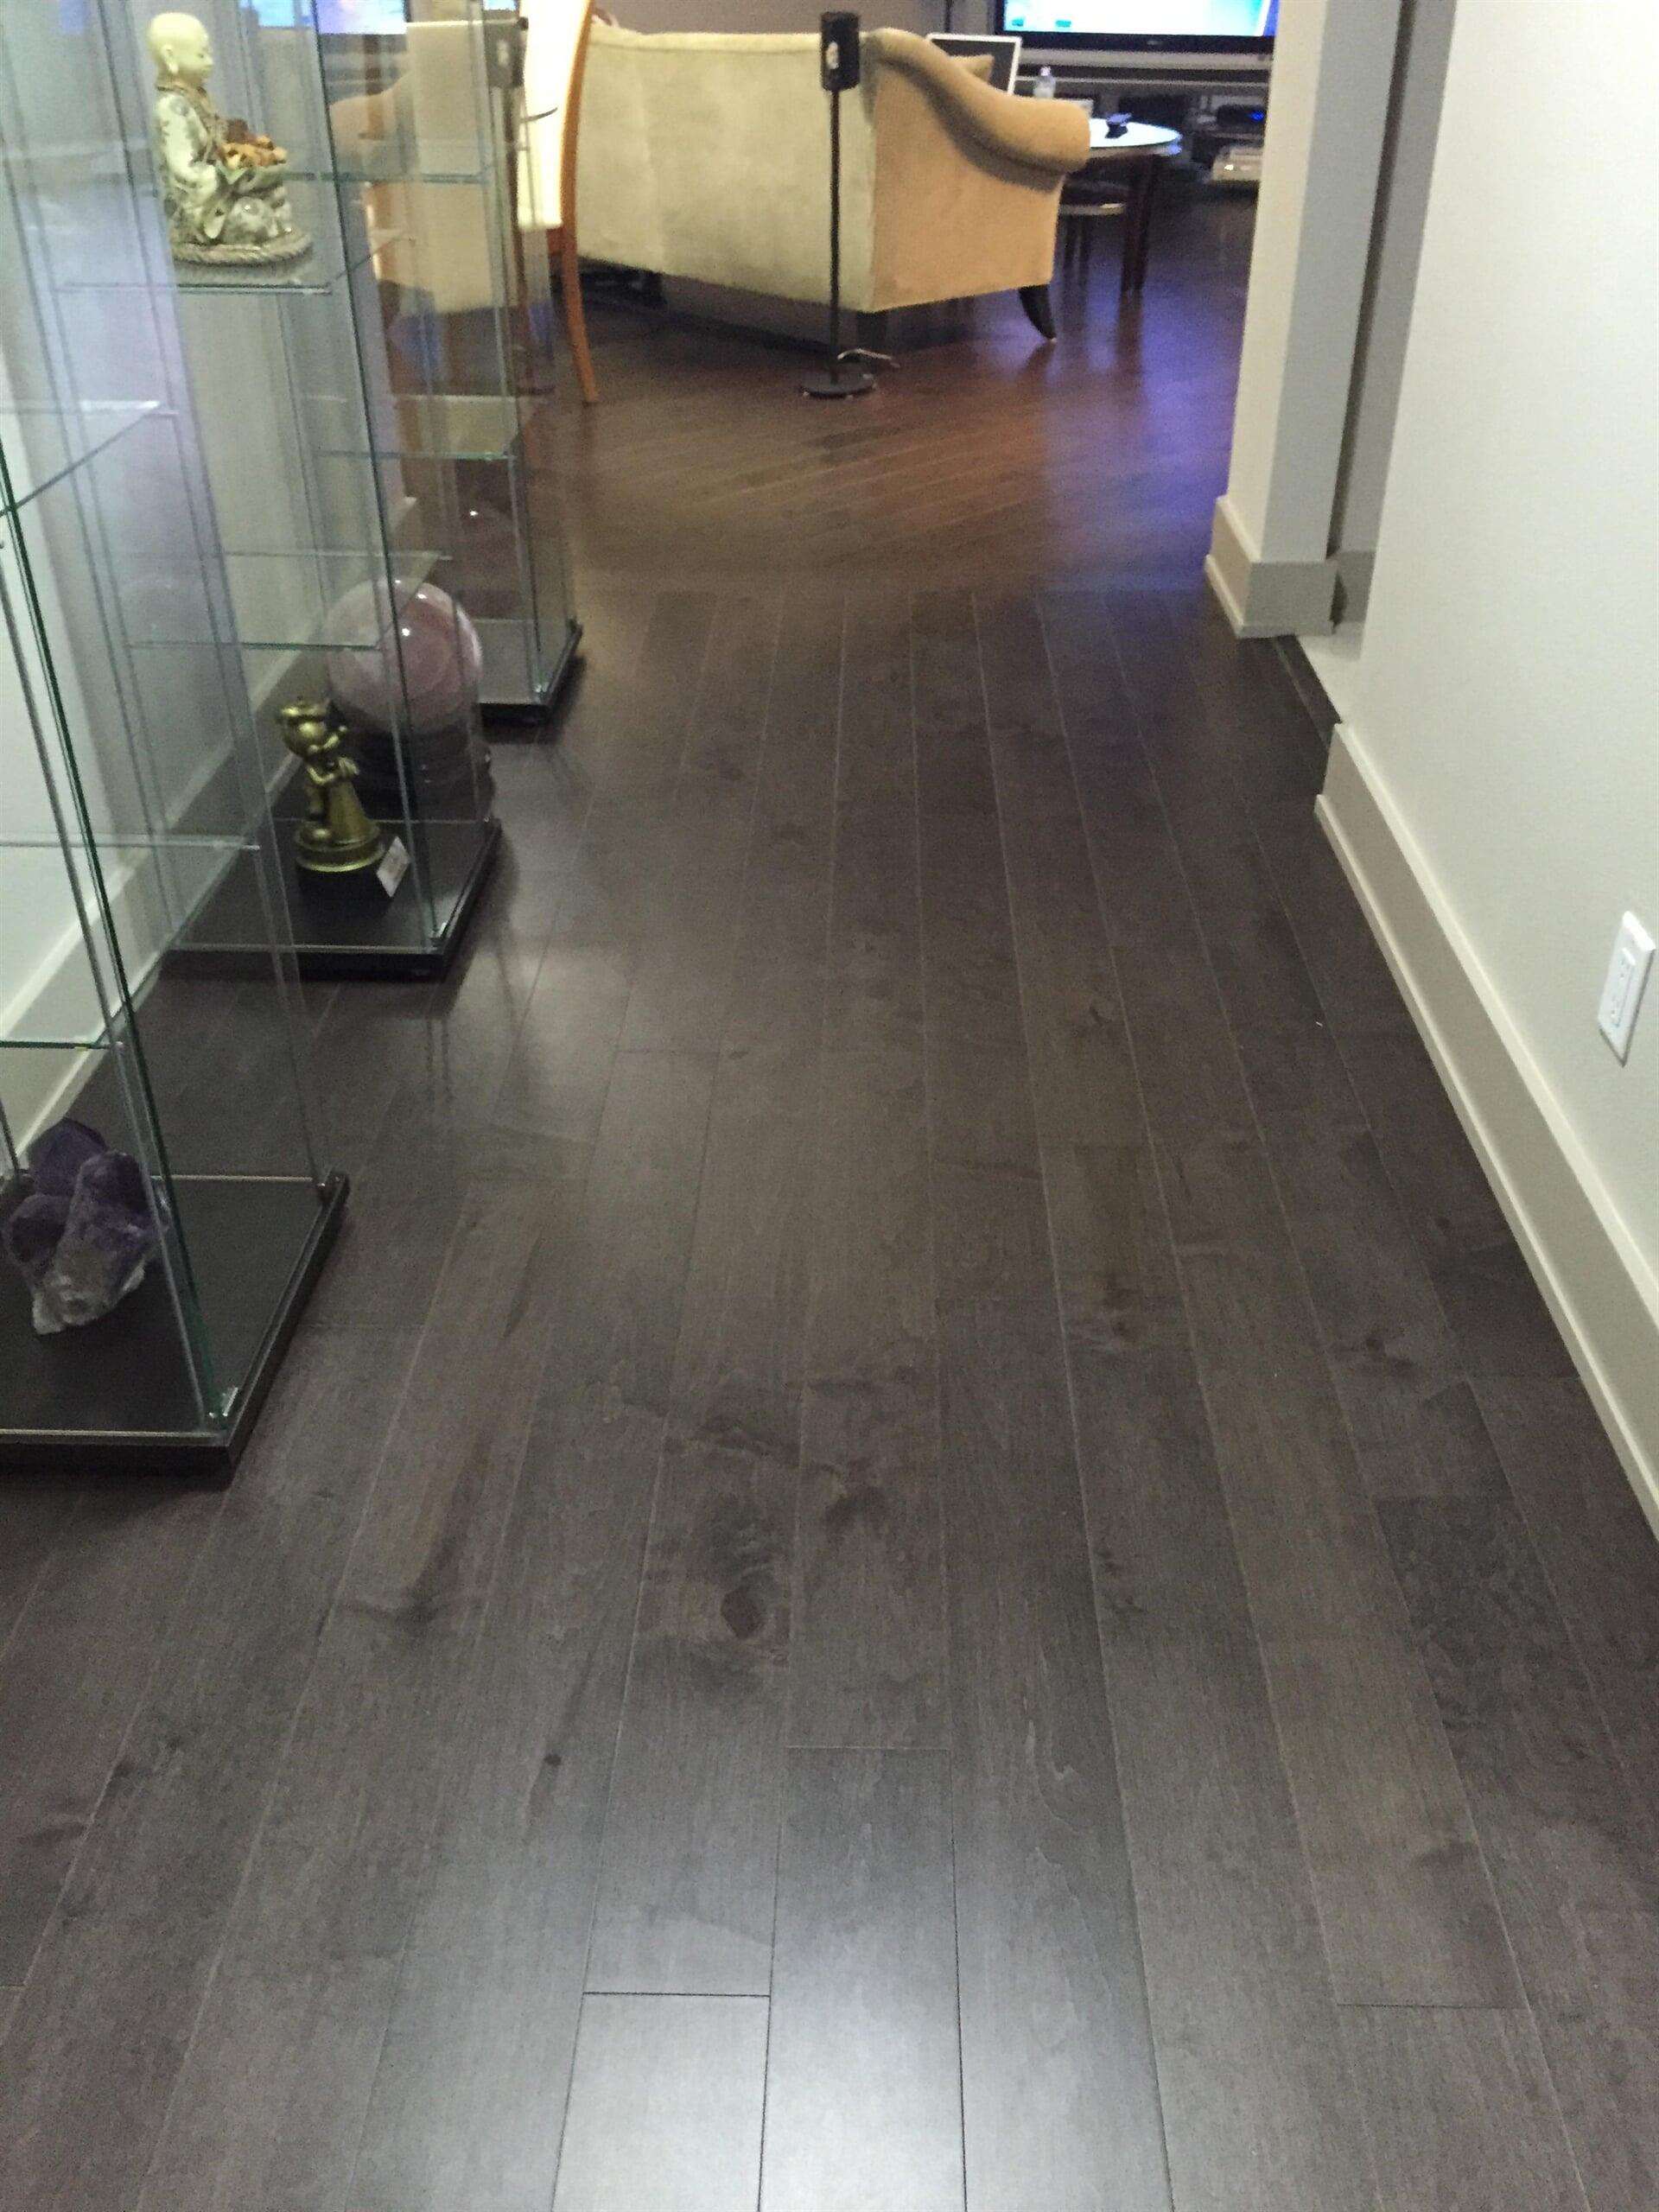 Grey wood look flooring in Clearwater, FL from Floor Depot